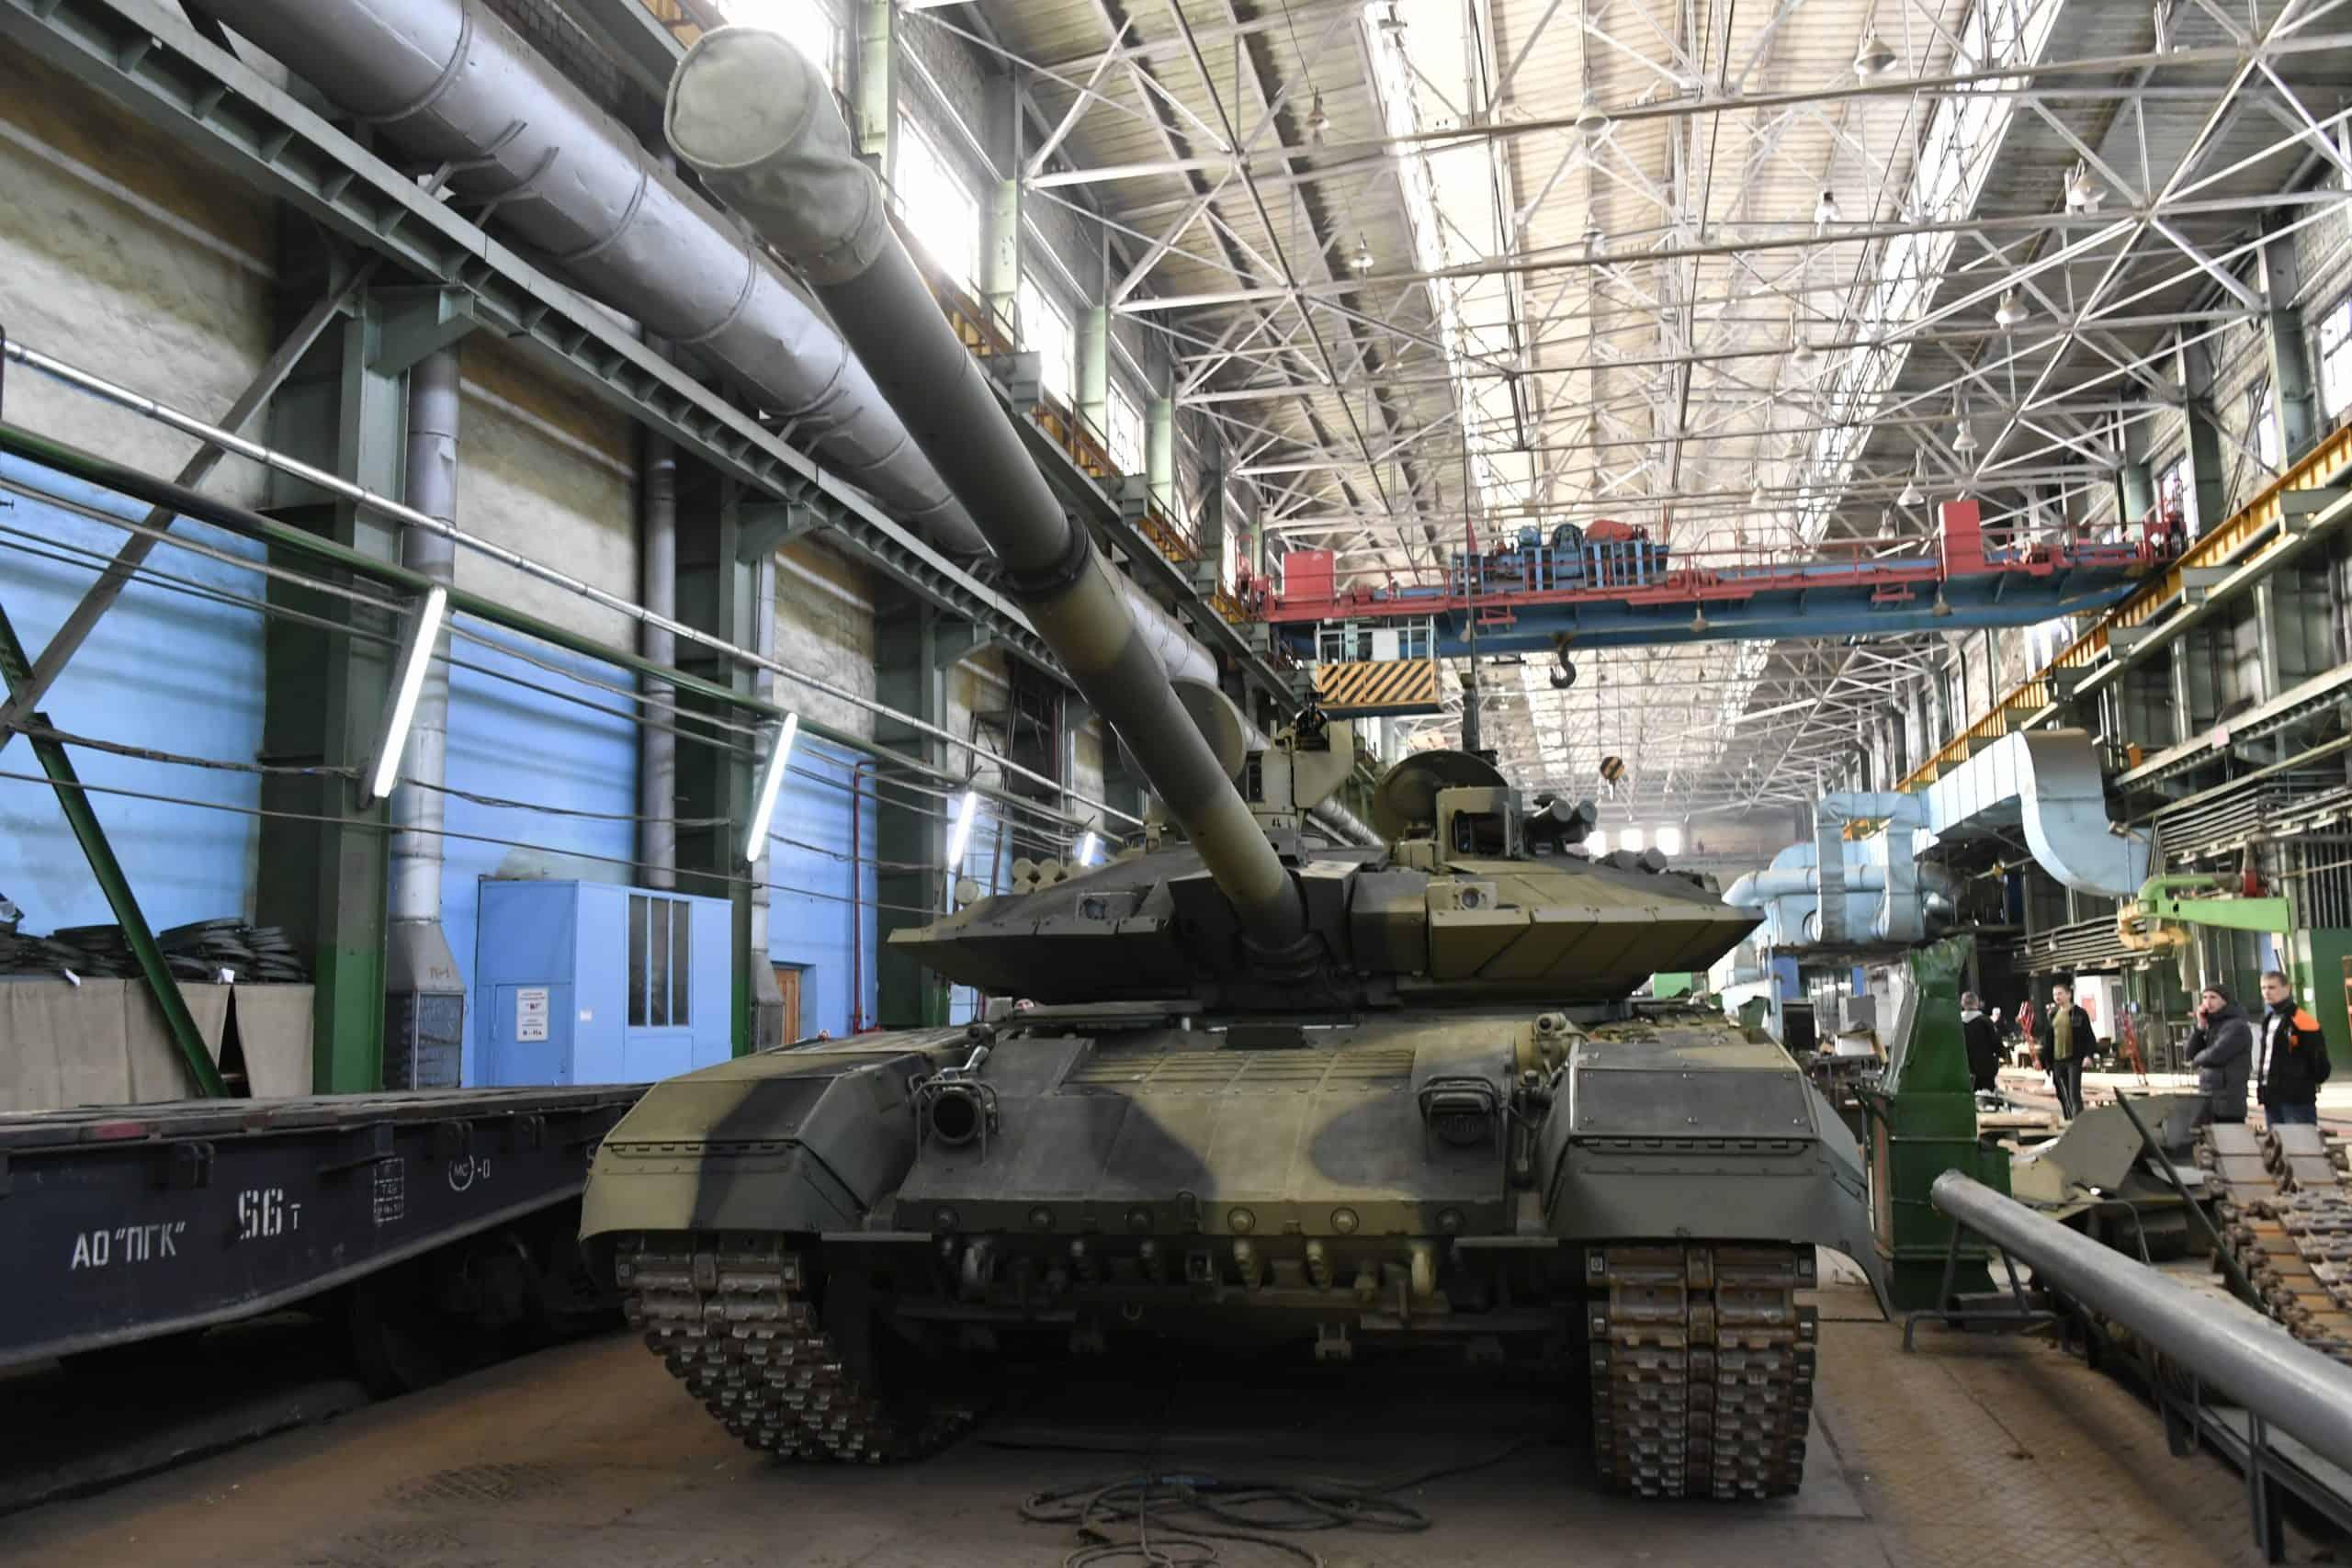 Танк Т-90М, фото Уралвагонзавод, березень 2021